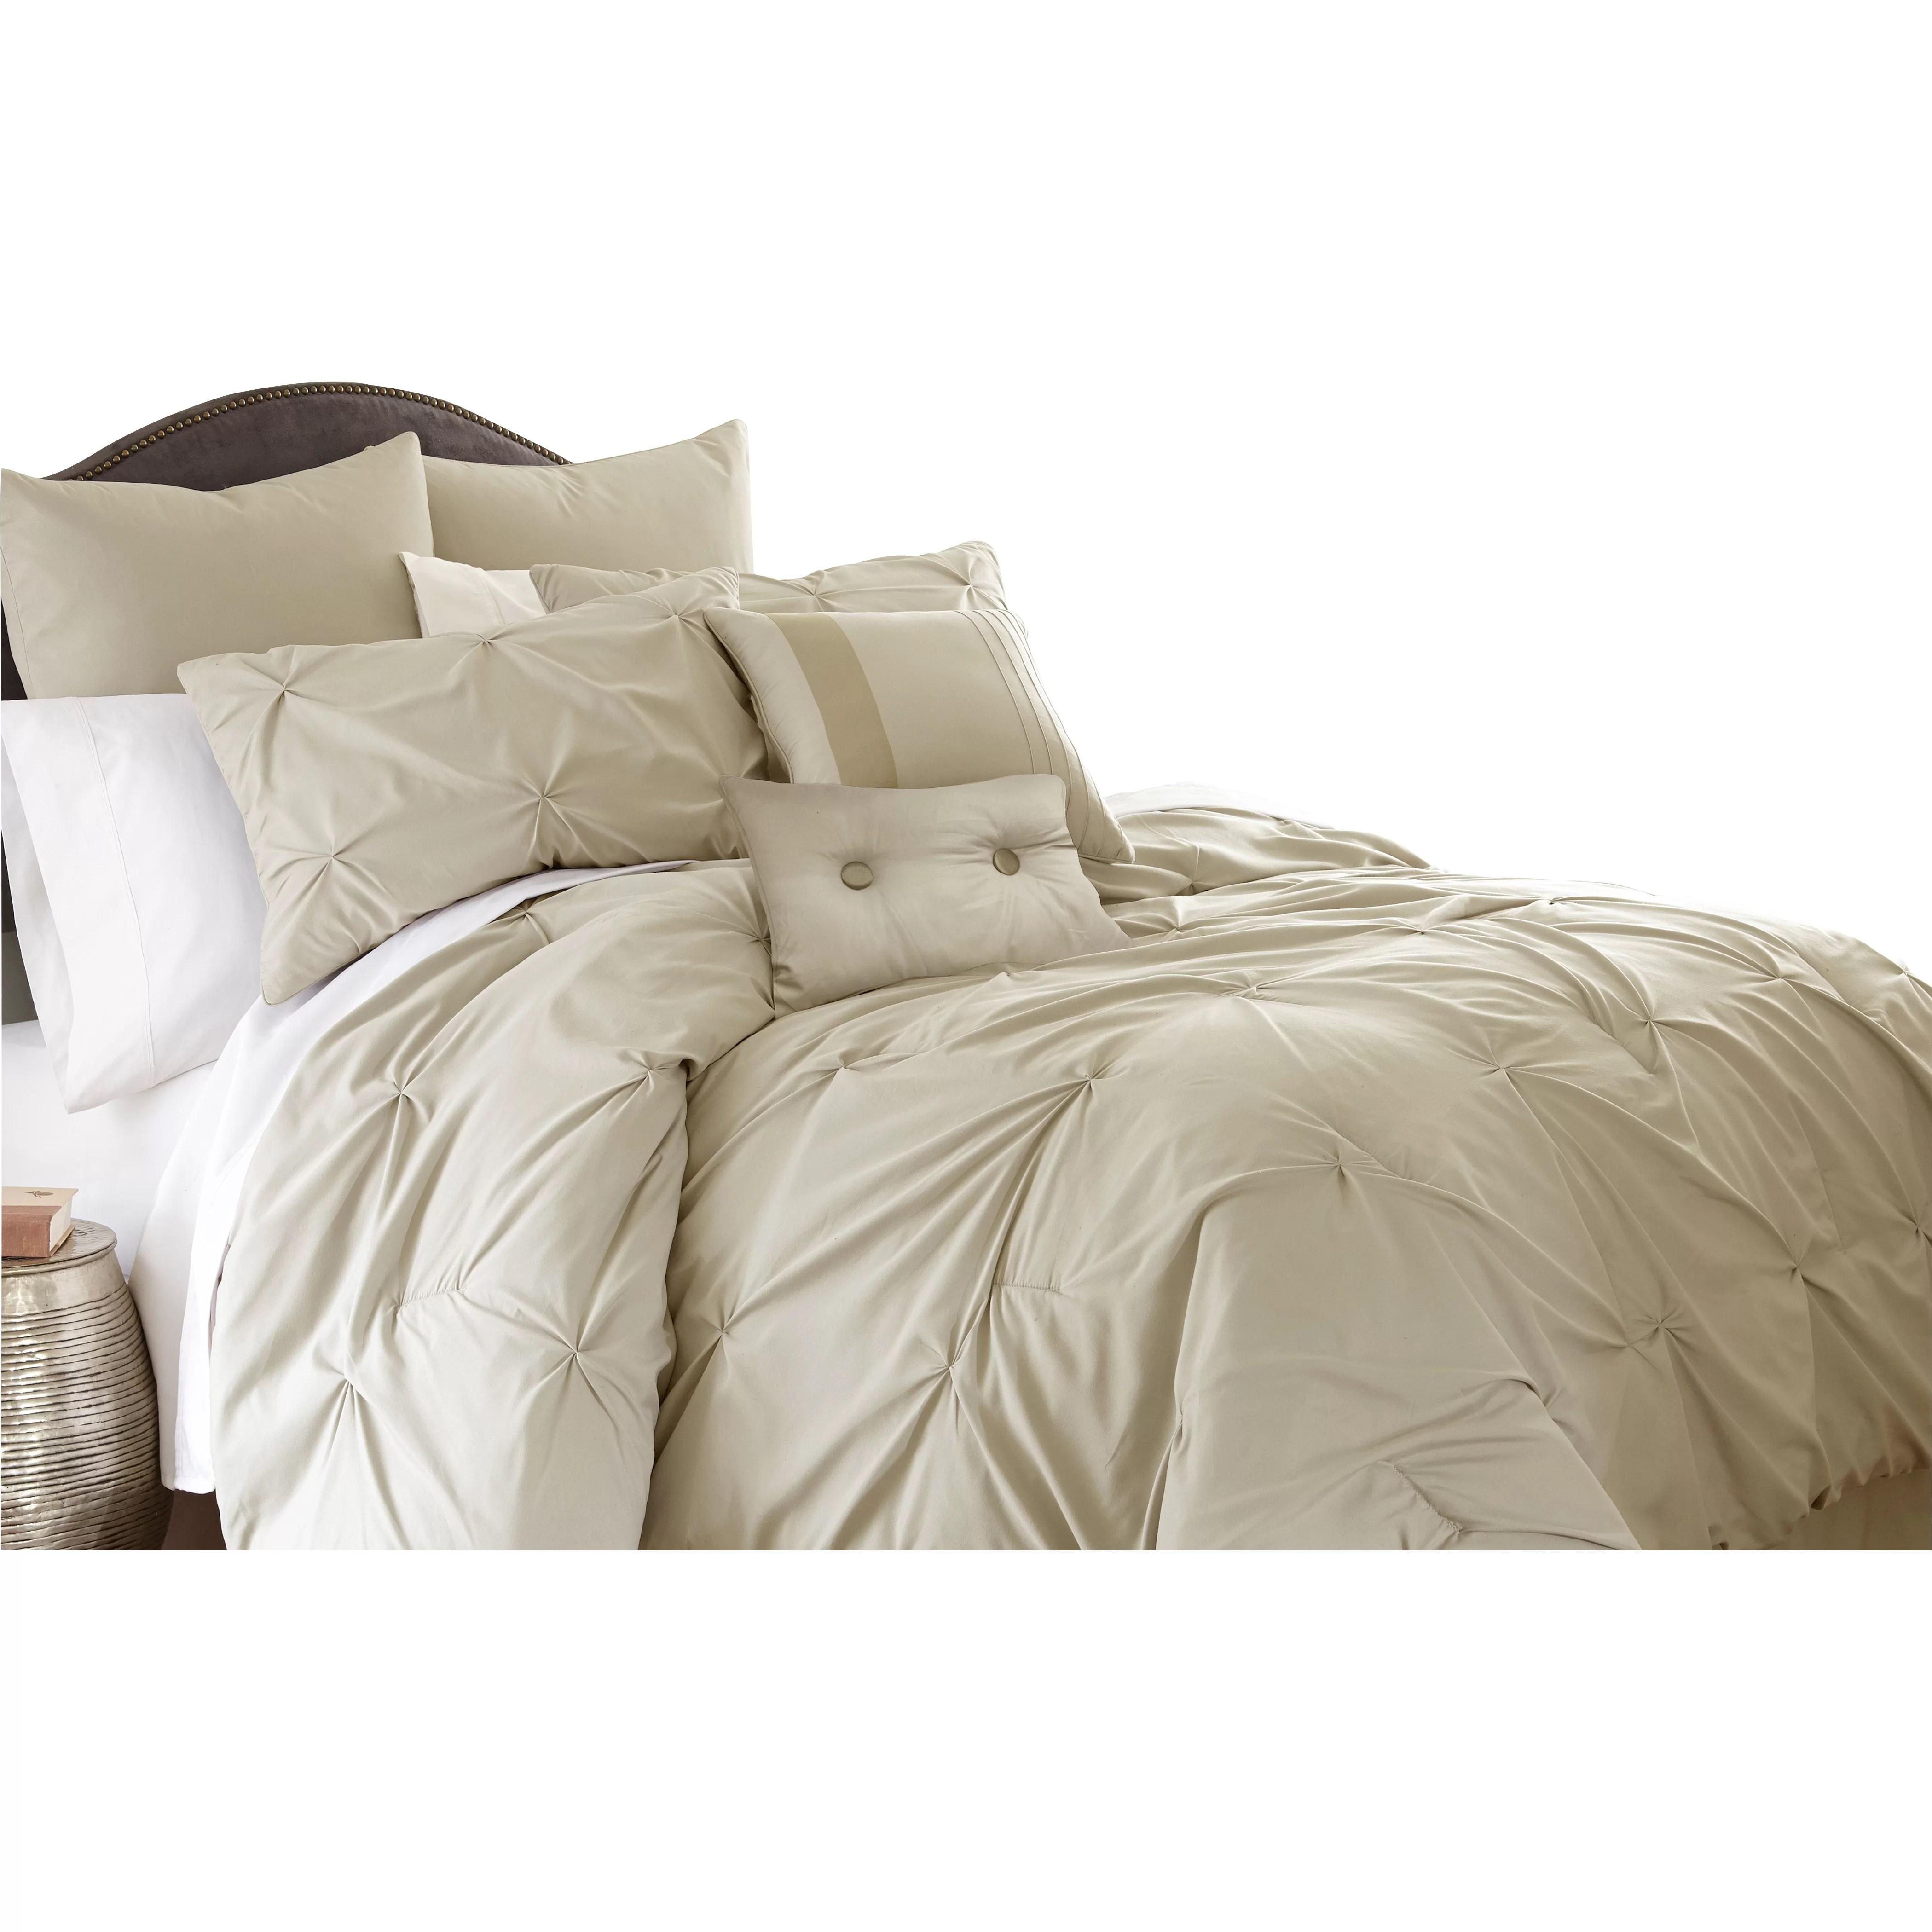 Lark Manor Louis 8 Piece Comforter Set & Reviews